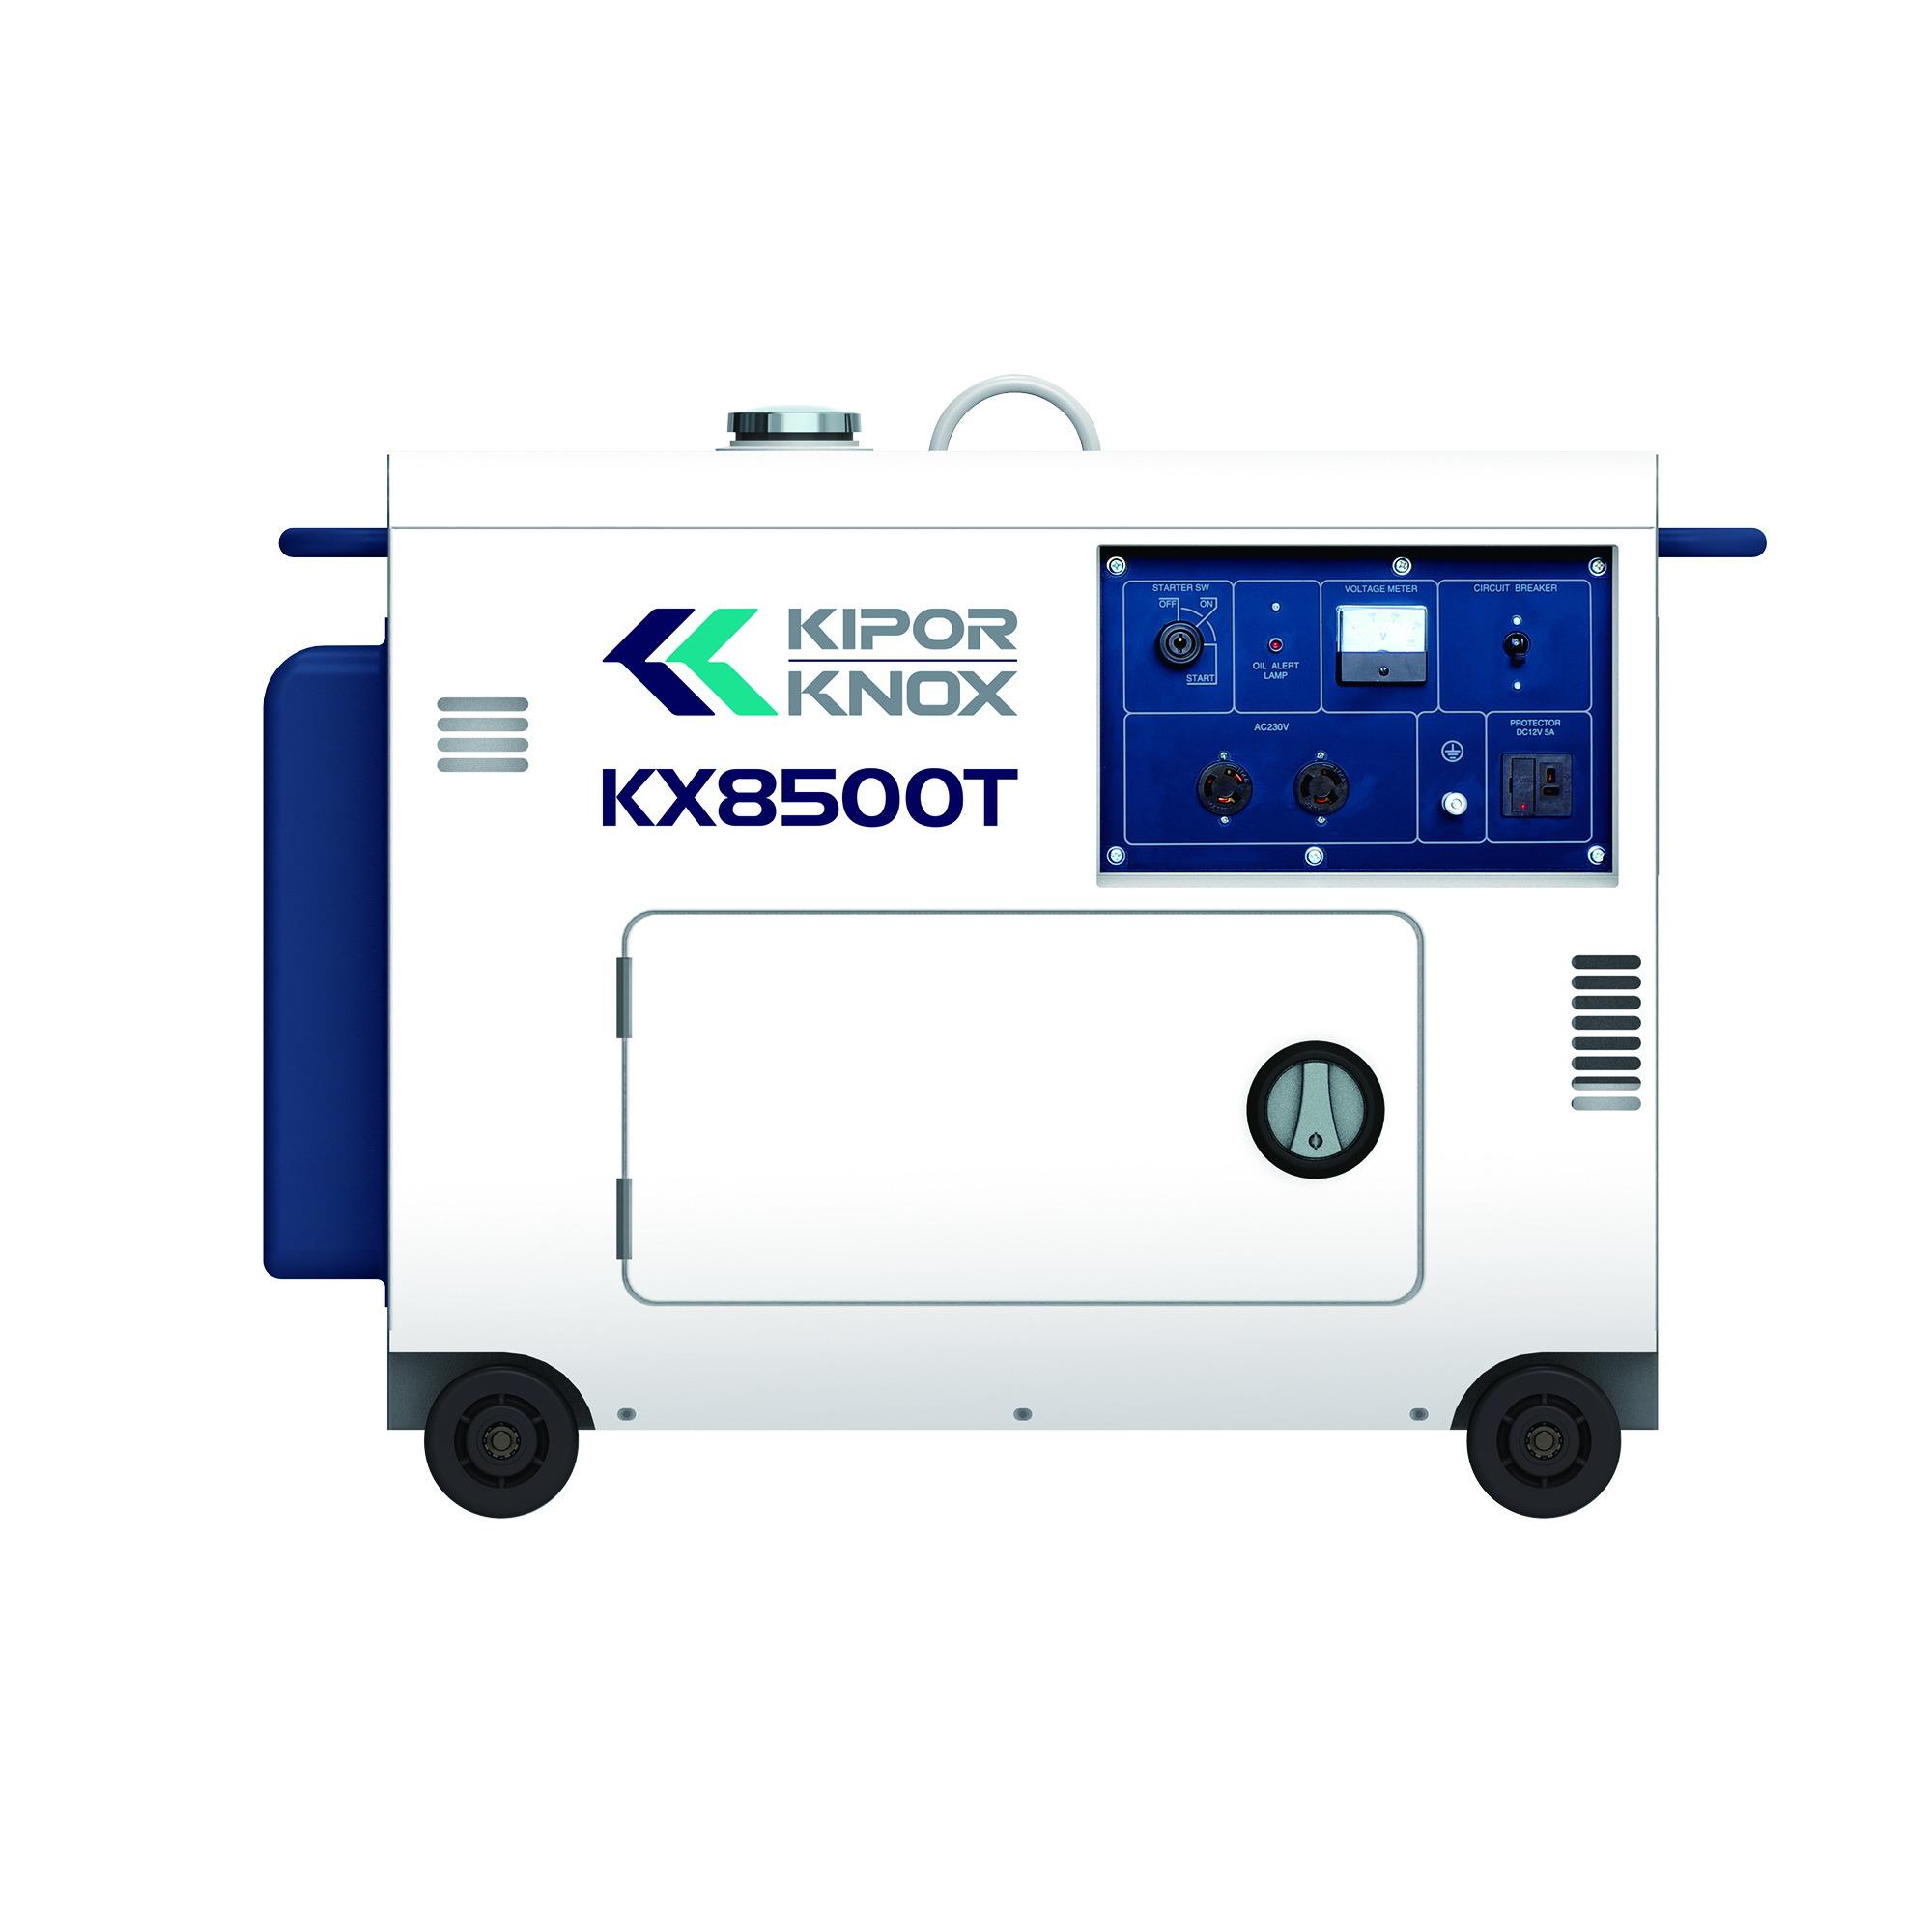 Kipor 6kw Diesel Portable Silent Generator Set Kx8500t with Kipor Engine